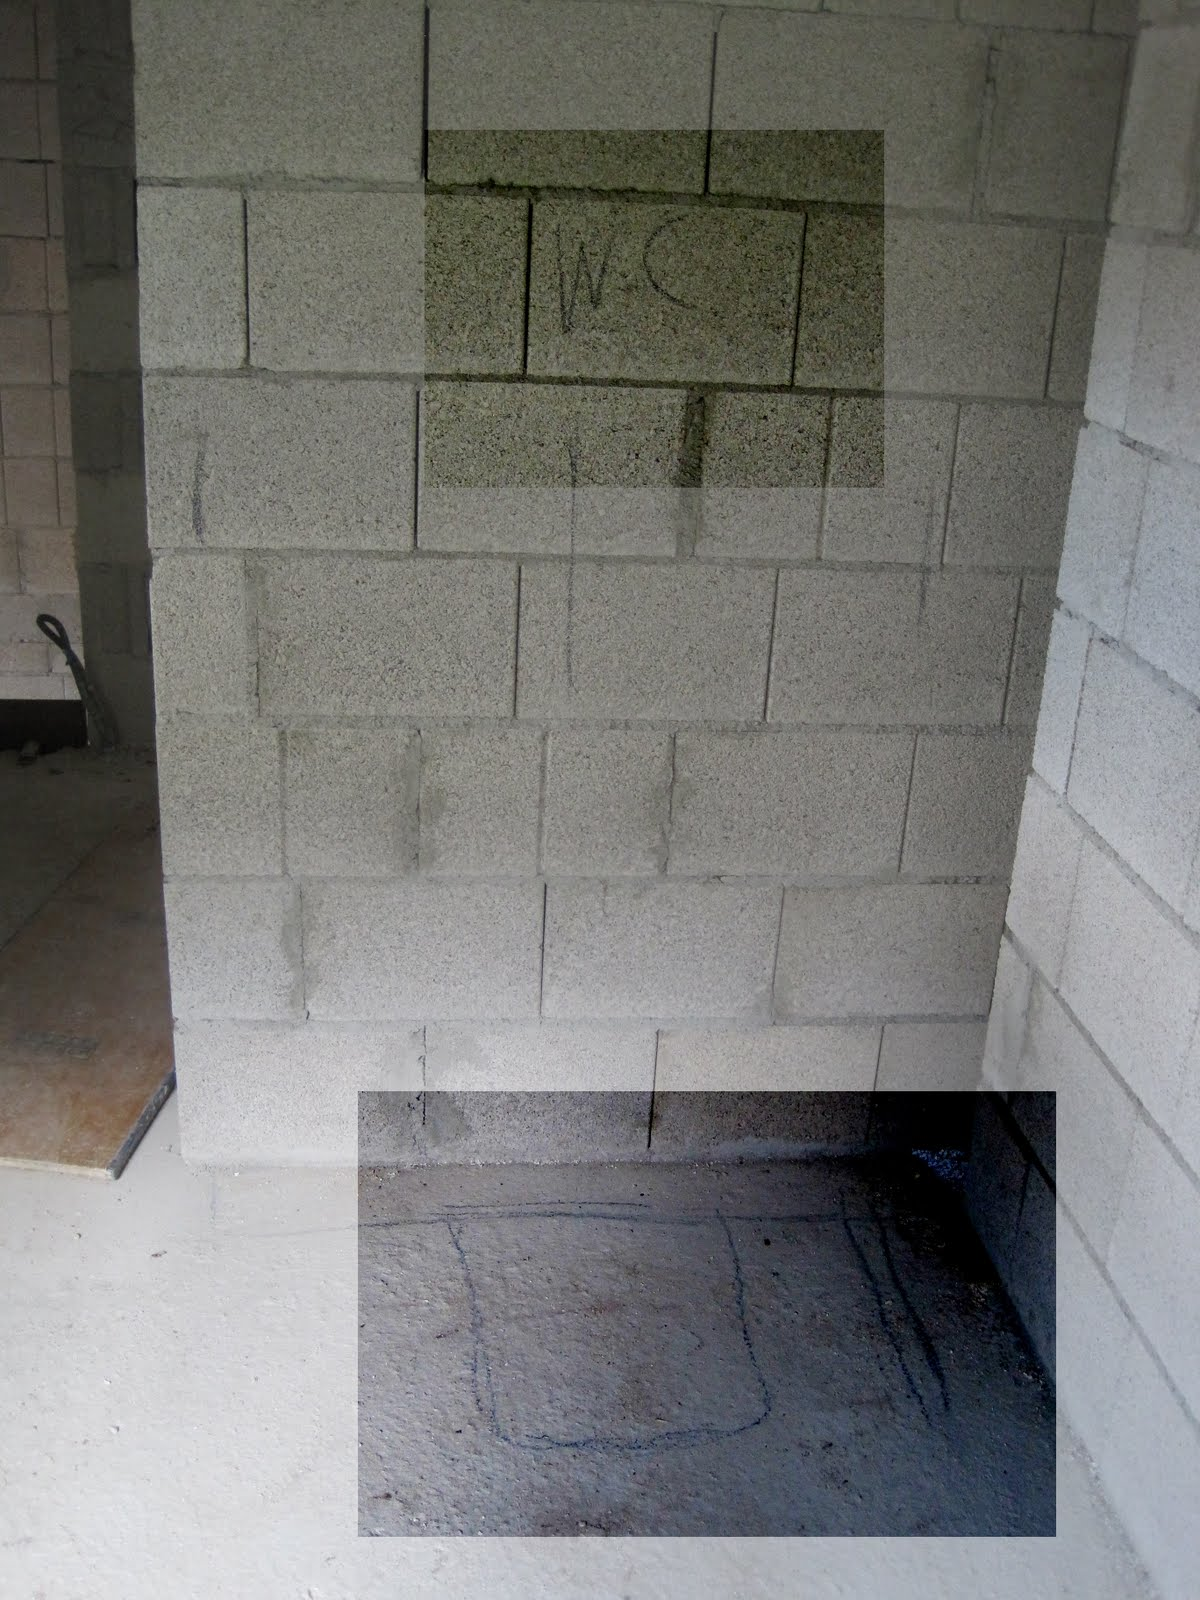 das noriplana bautagebuch sanit rinstallation firma markus barth e k f rth rohinstallation. Black Bedroom Furniture Sets. Home Design Ideas